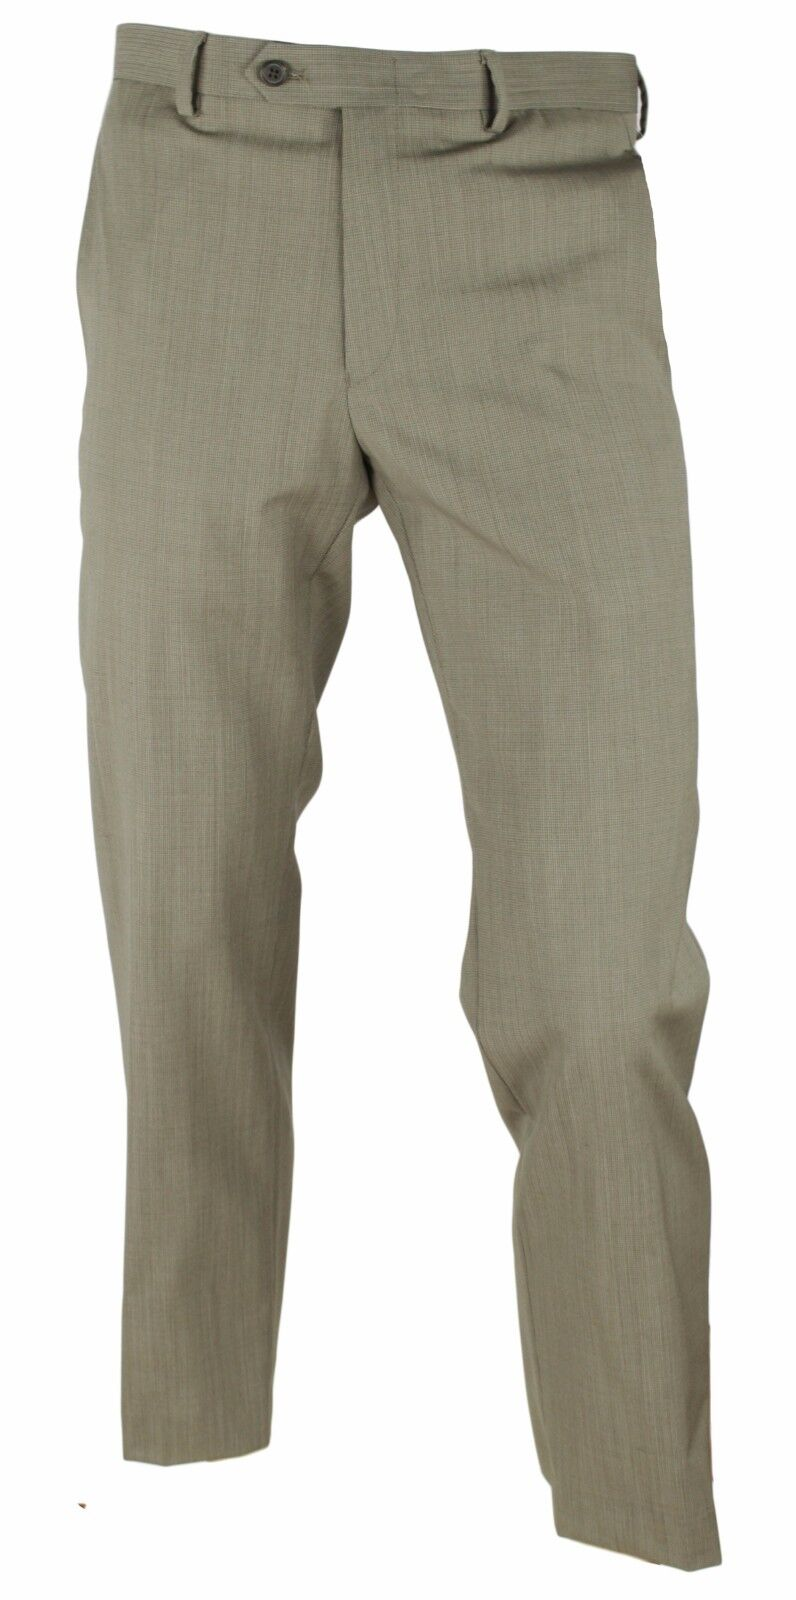 Blazerand Pant Kenneth Cole REACTION Mens Slim Fit Suit Separate ,